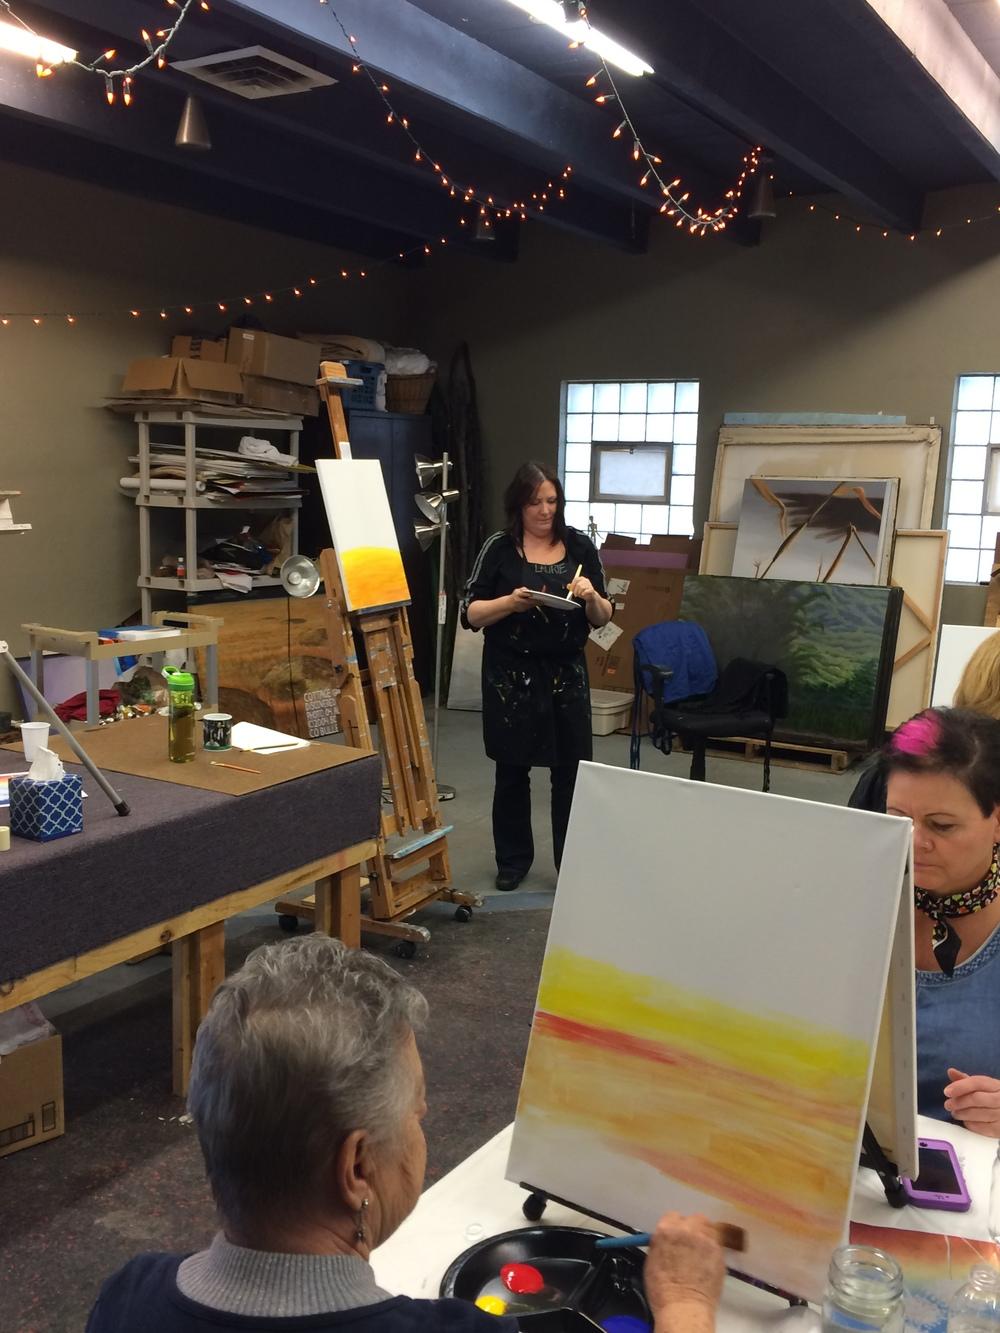 Paint Nite and DIY Art at The Tornado Factory